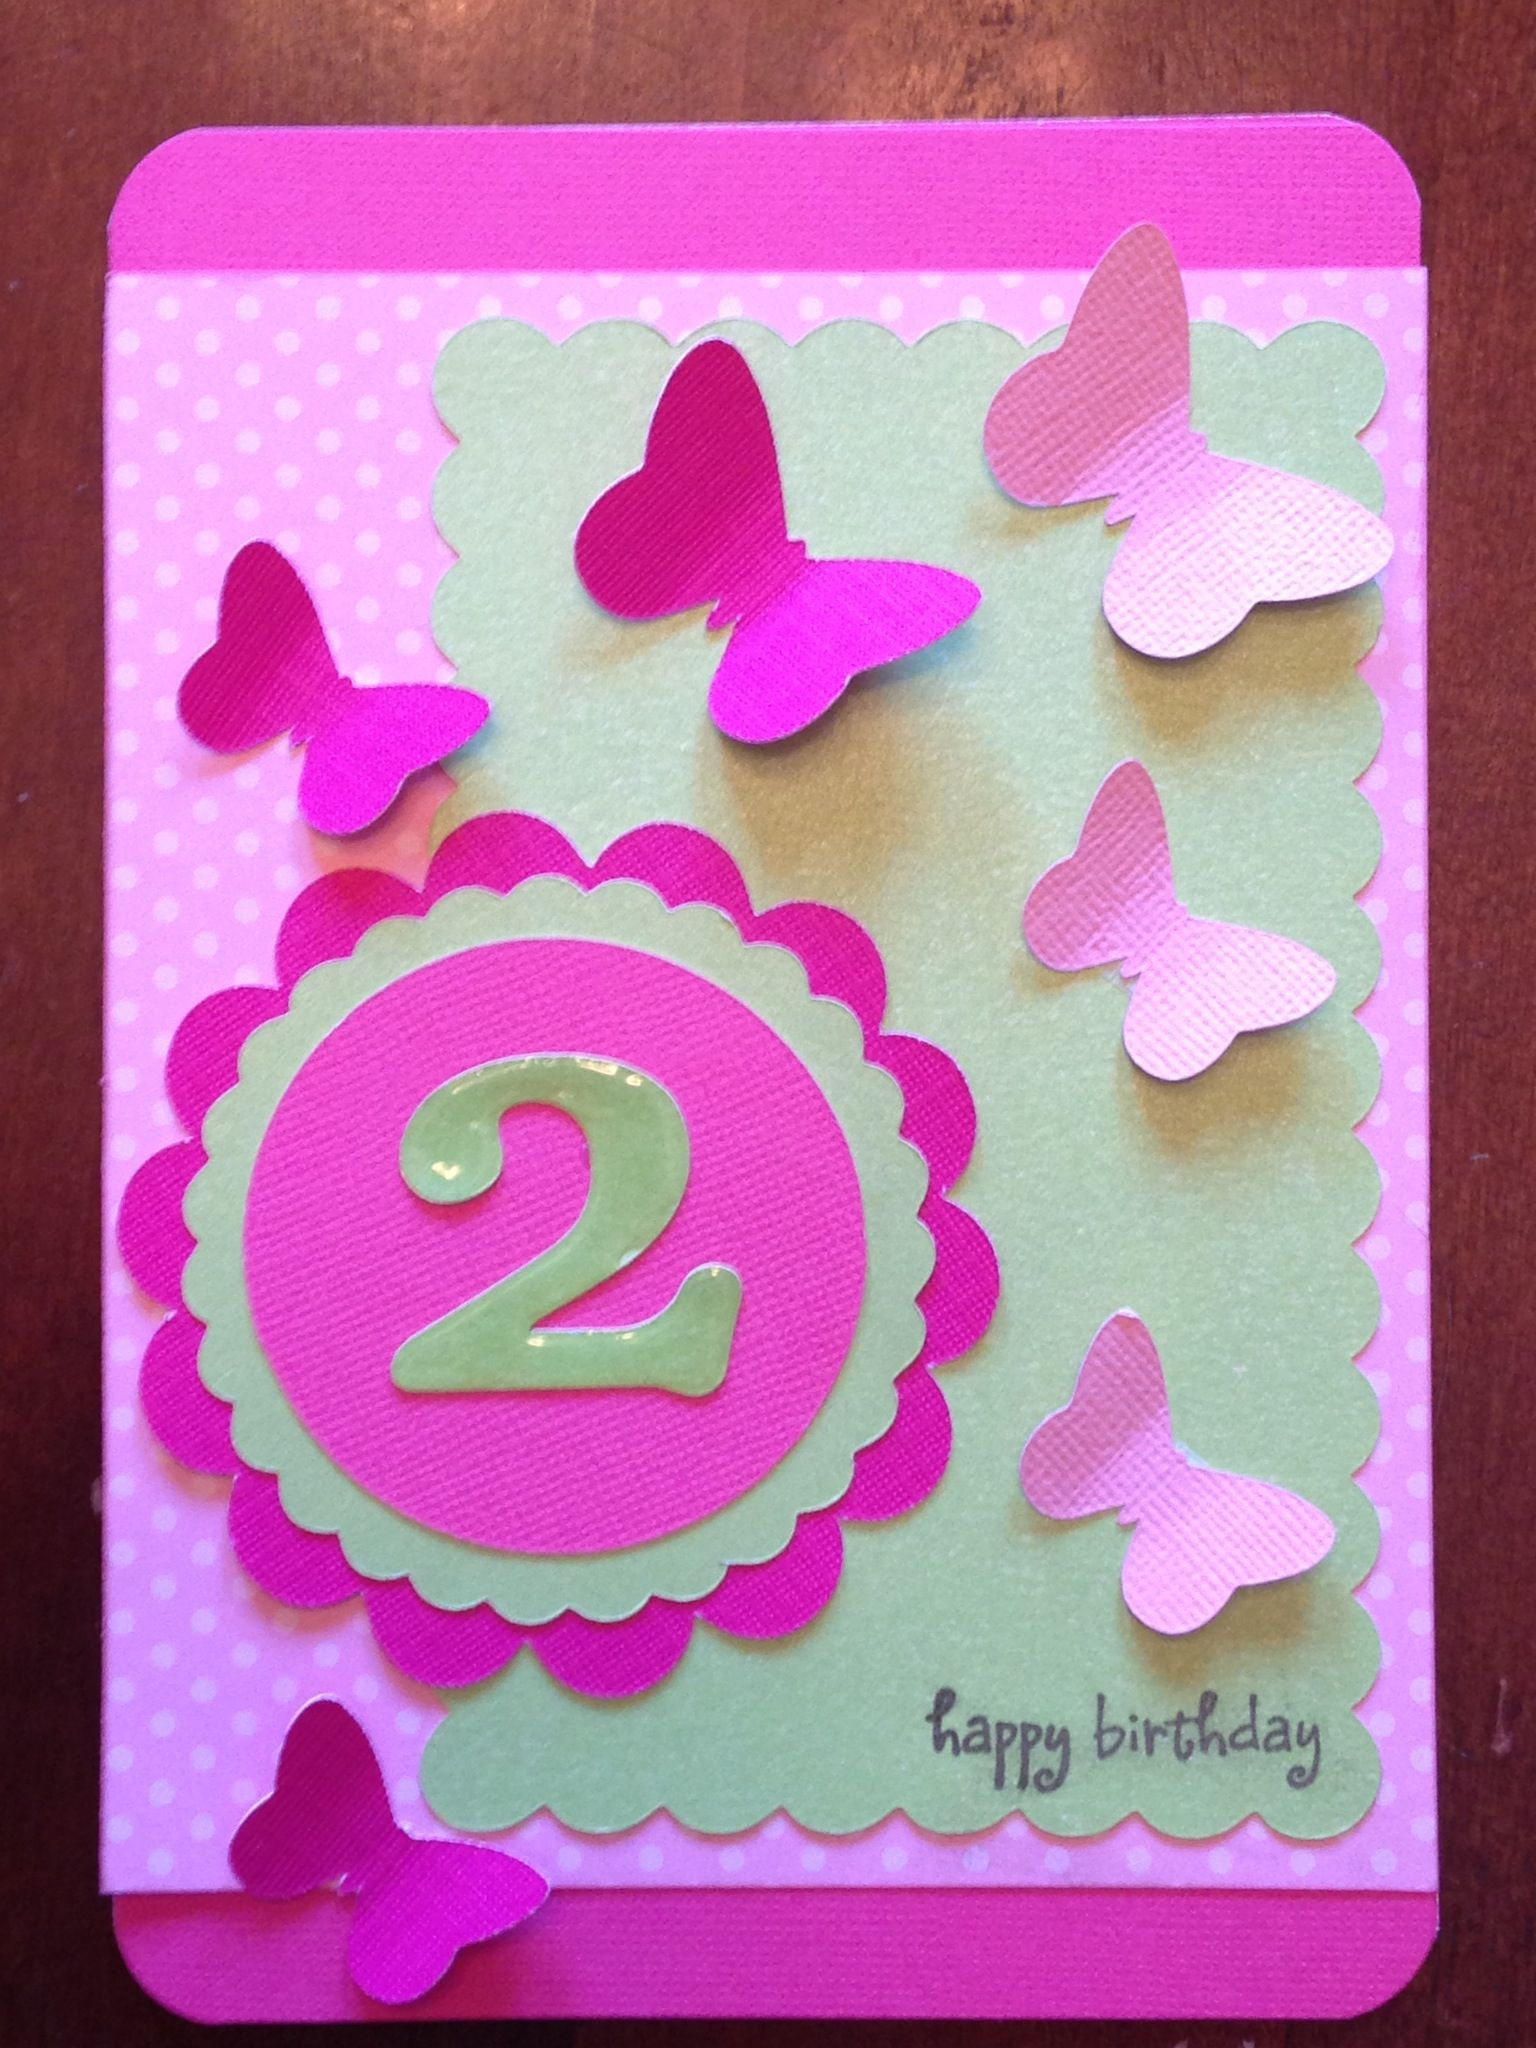 Little Girls 2nd Birthday Card I Made